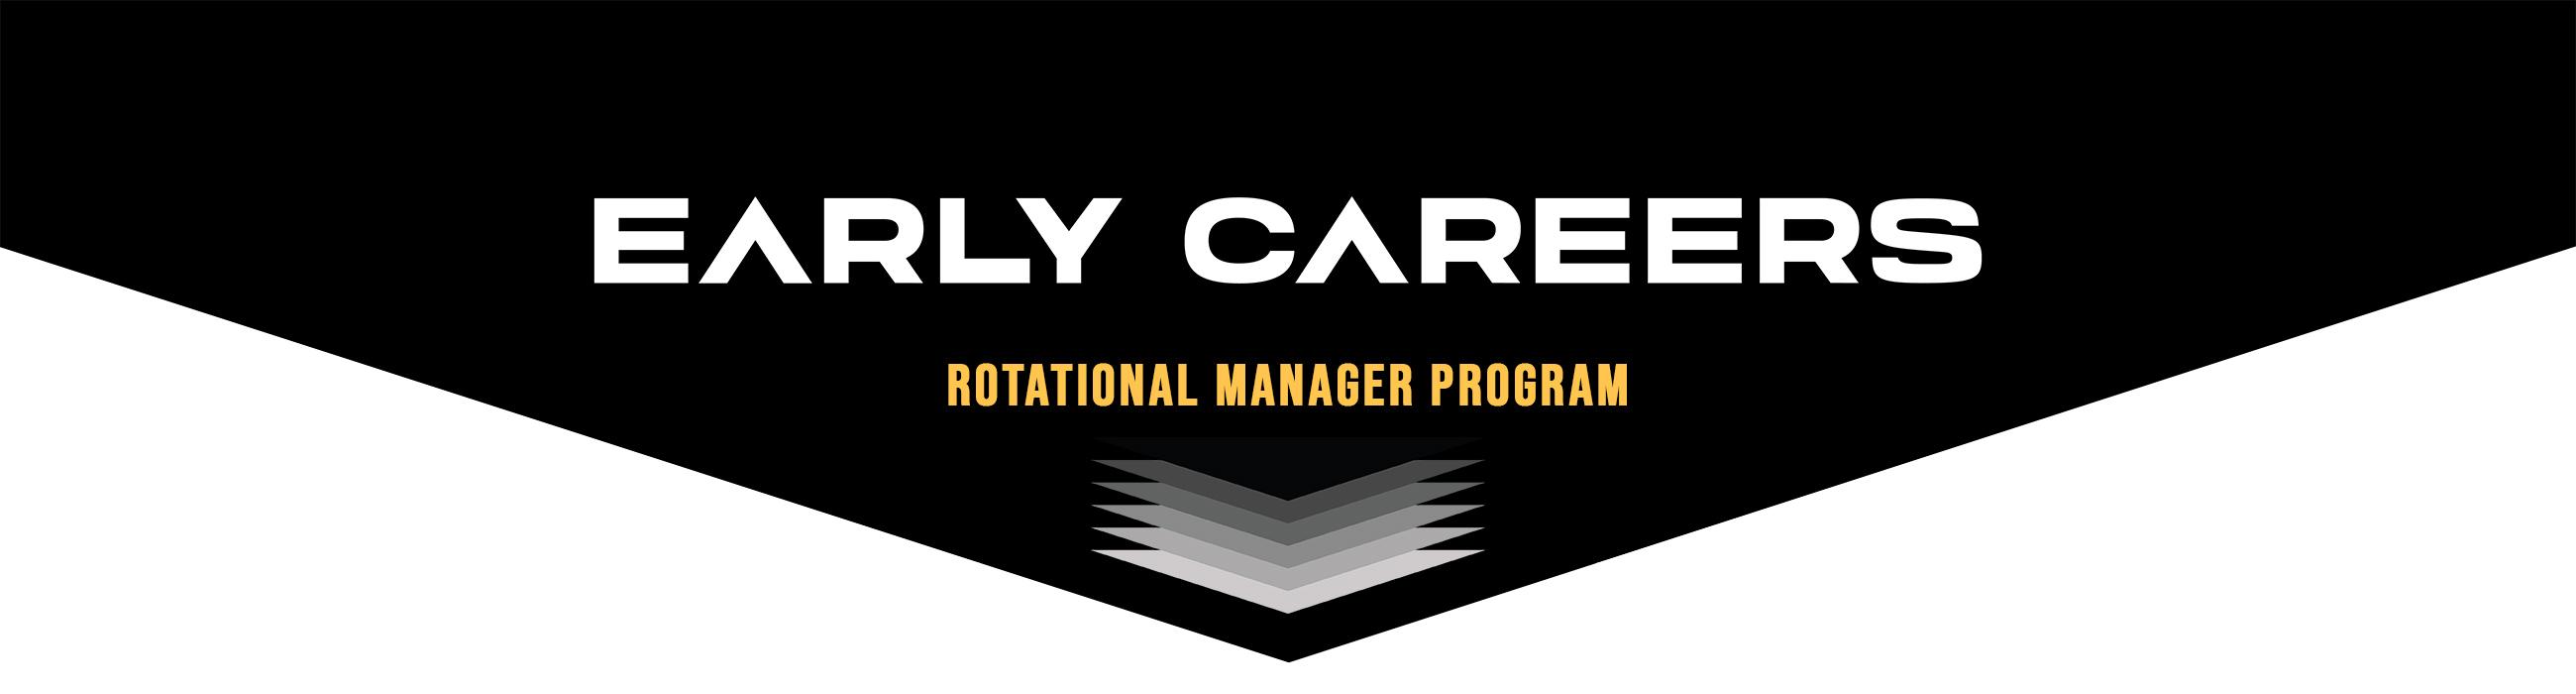 header_rotational_manager_program